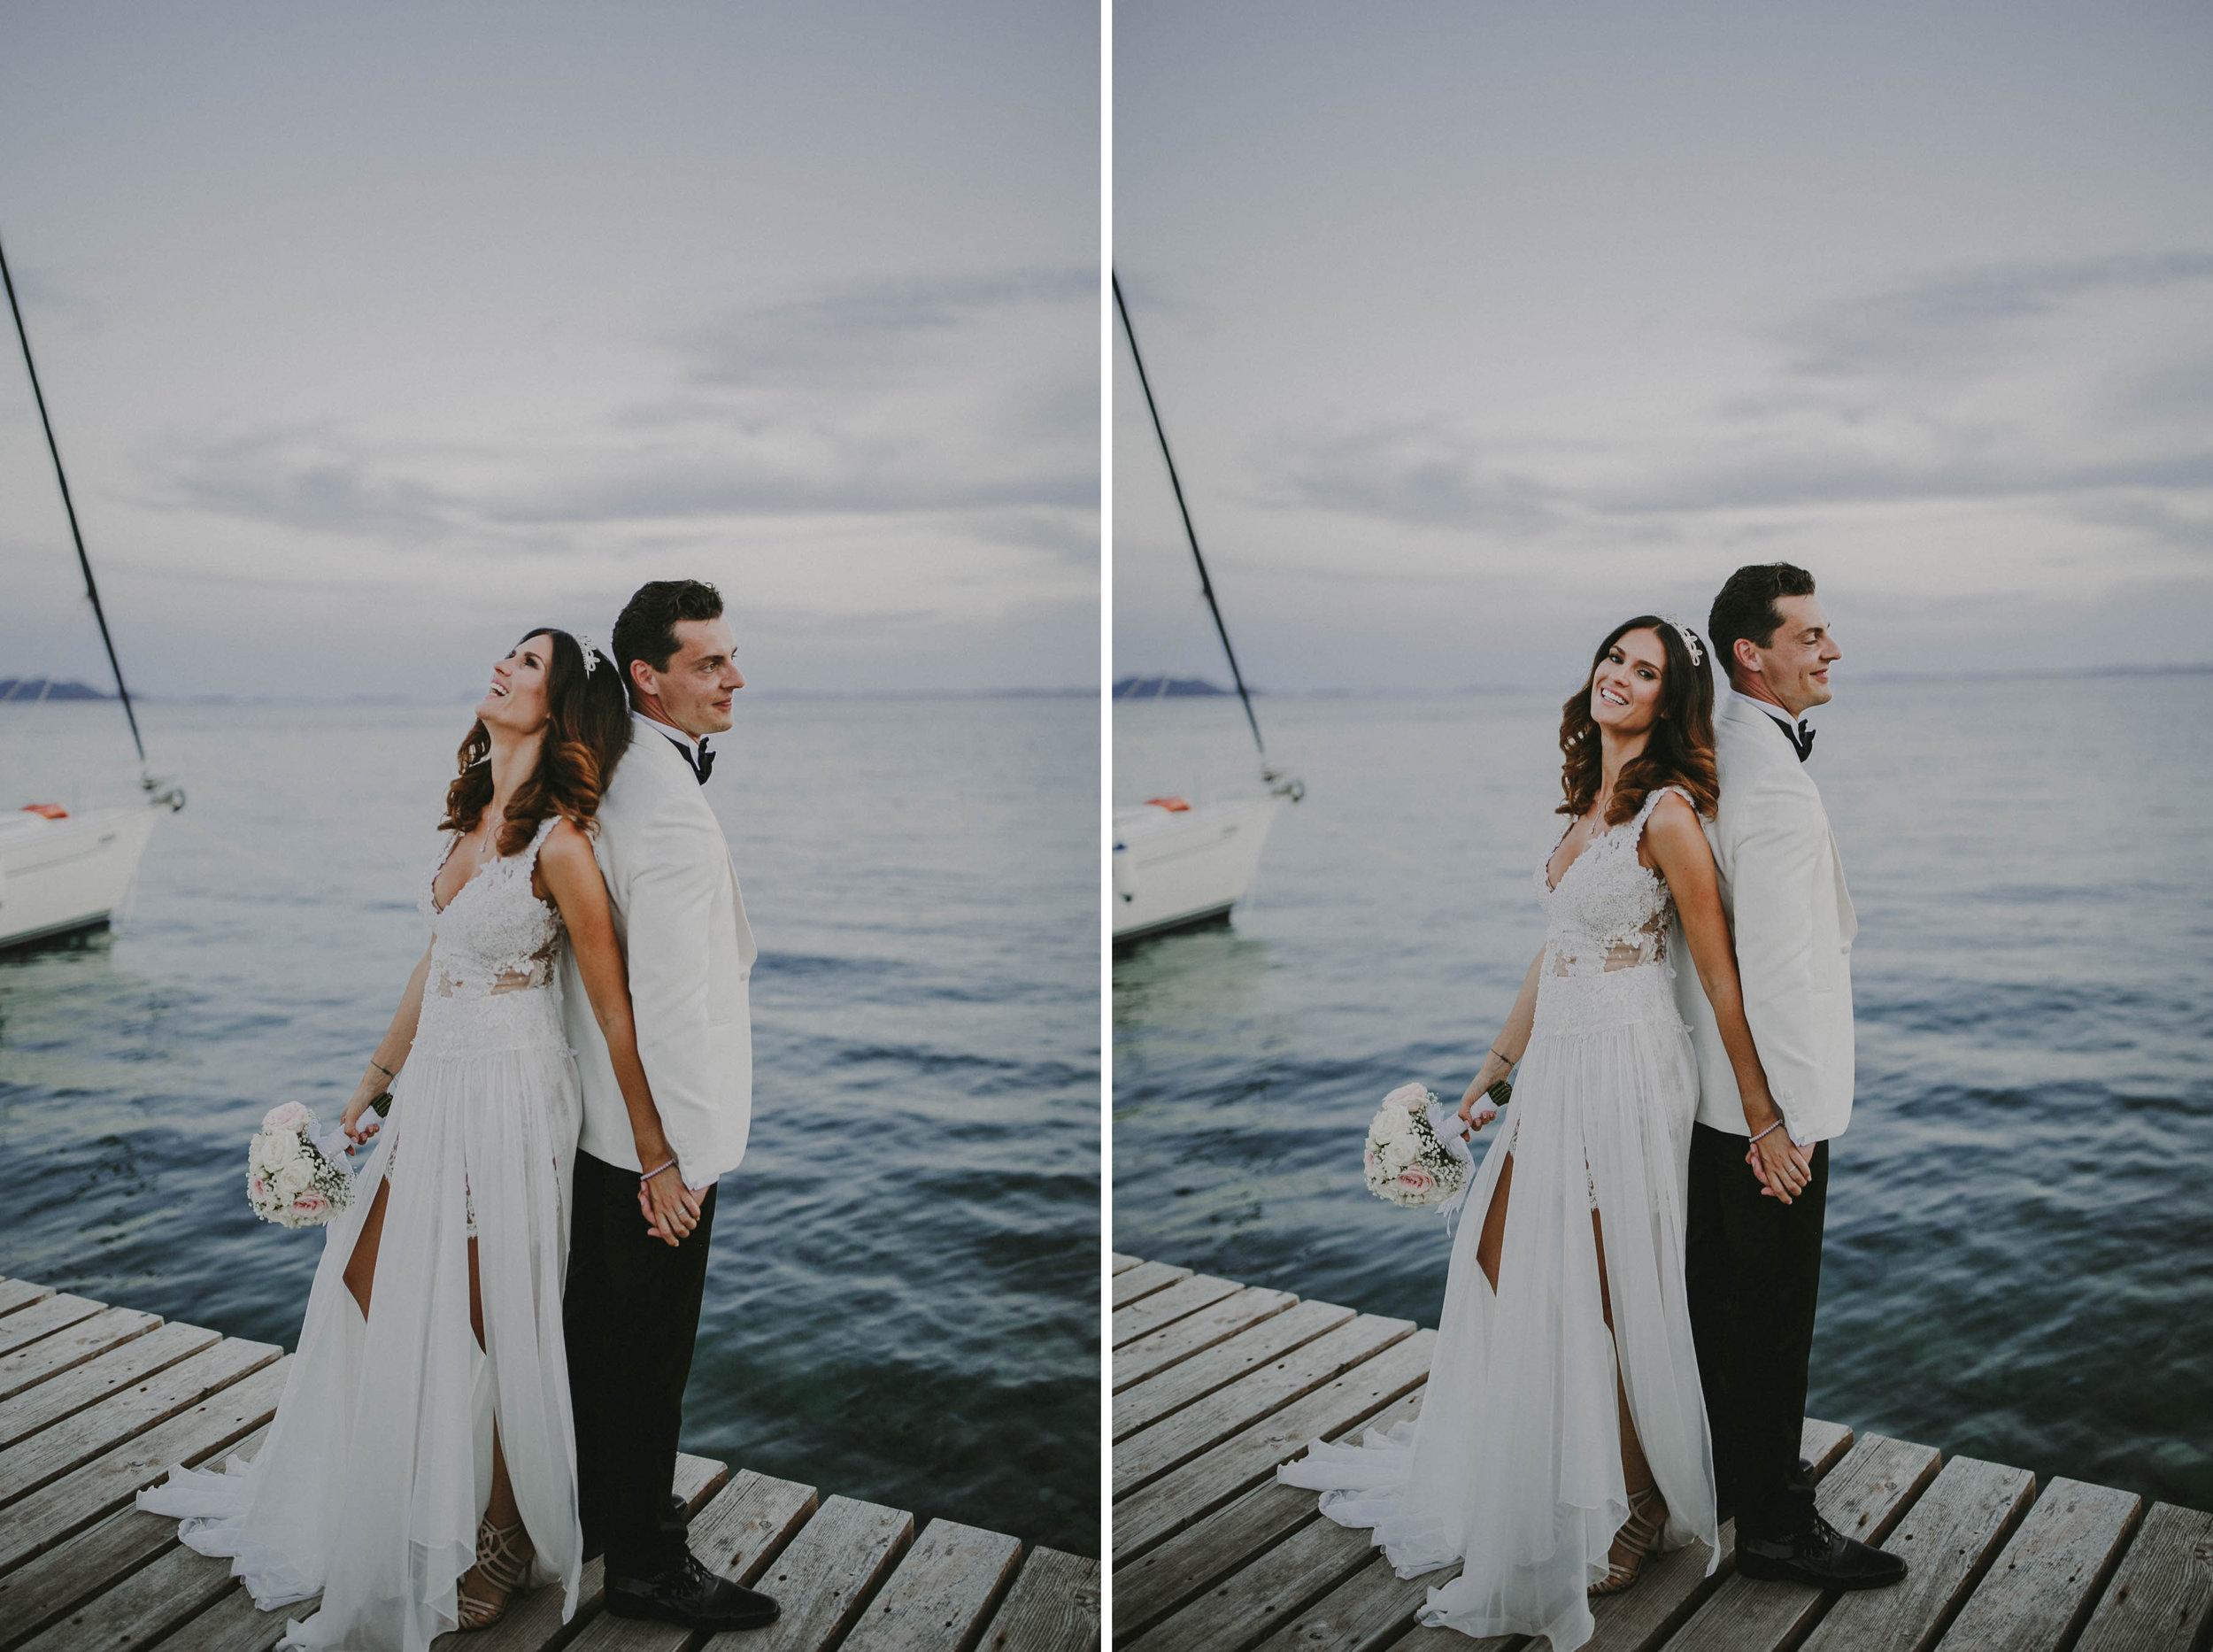 sylvia&dimitri-Wedding-Crvena_Luka-Croatia-80(8942)2.jpg